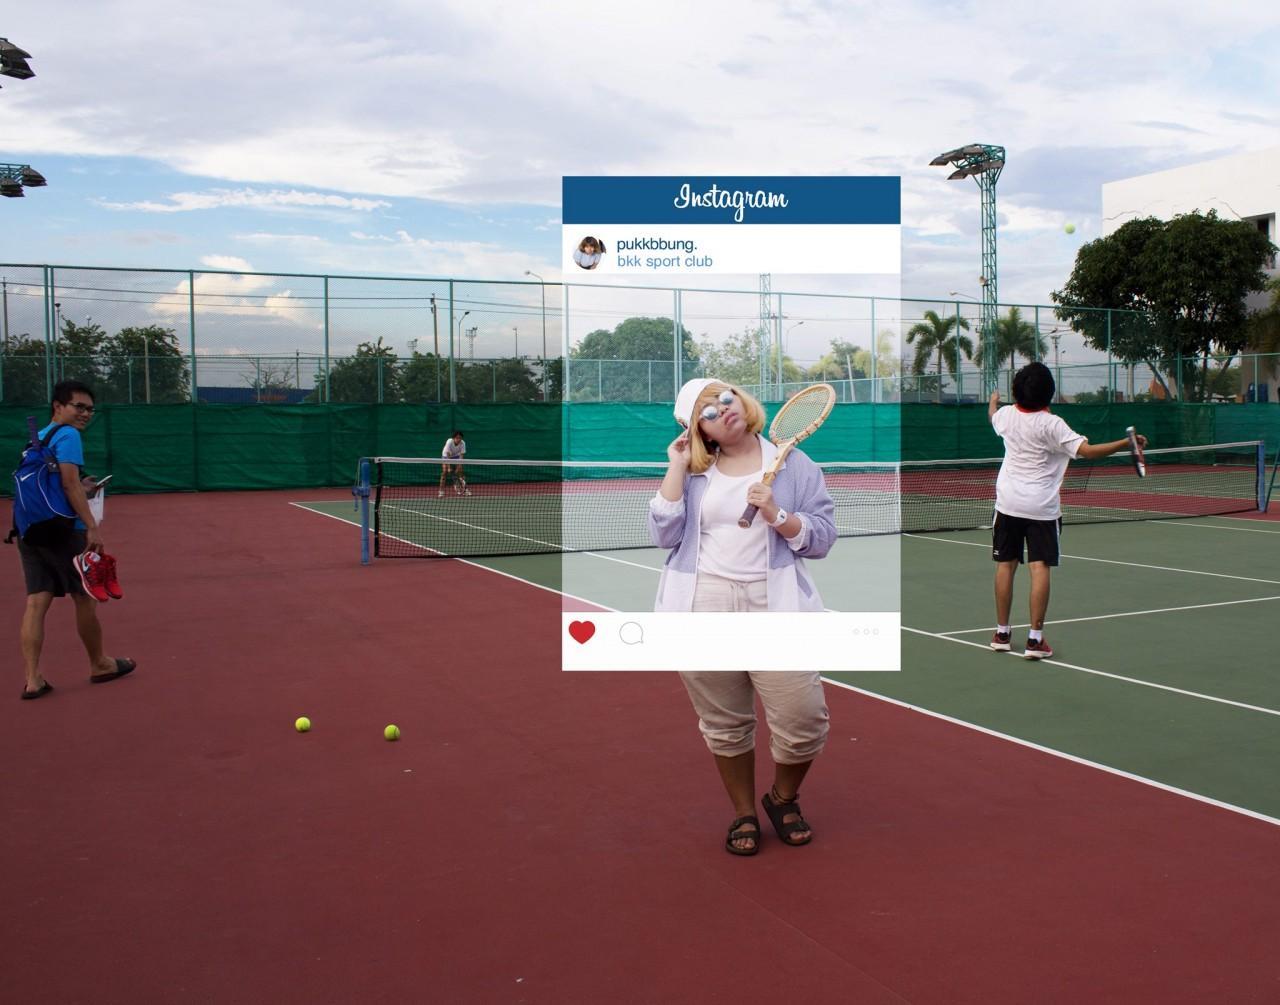 instagram-hros-cadre-04-1280x1005